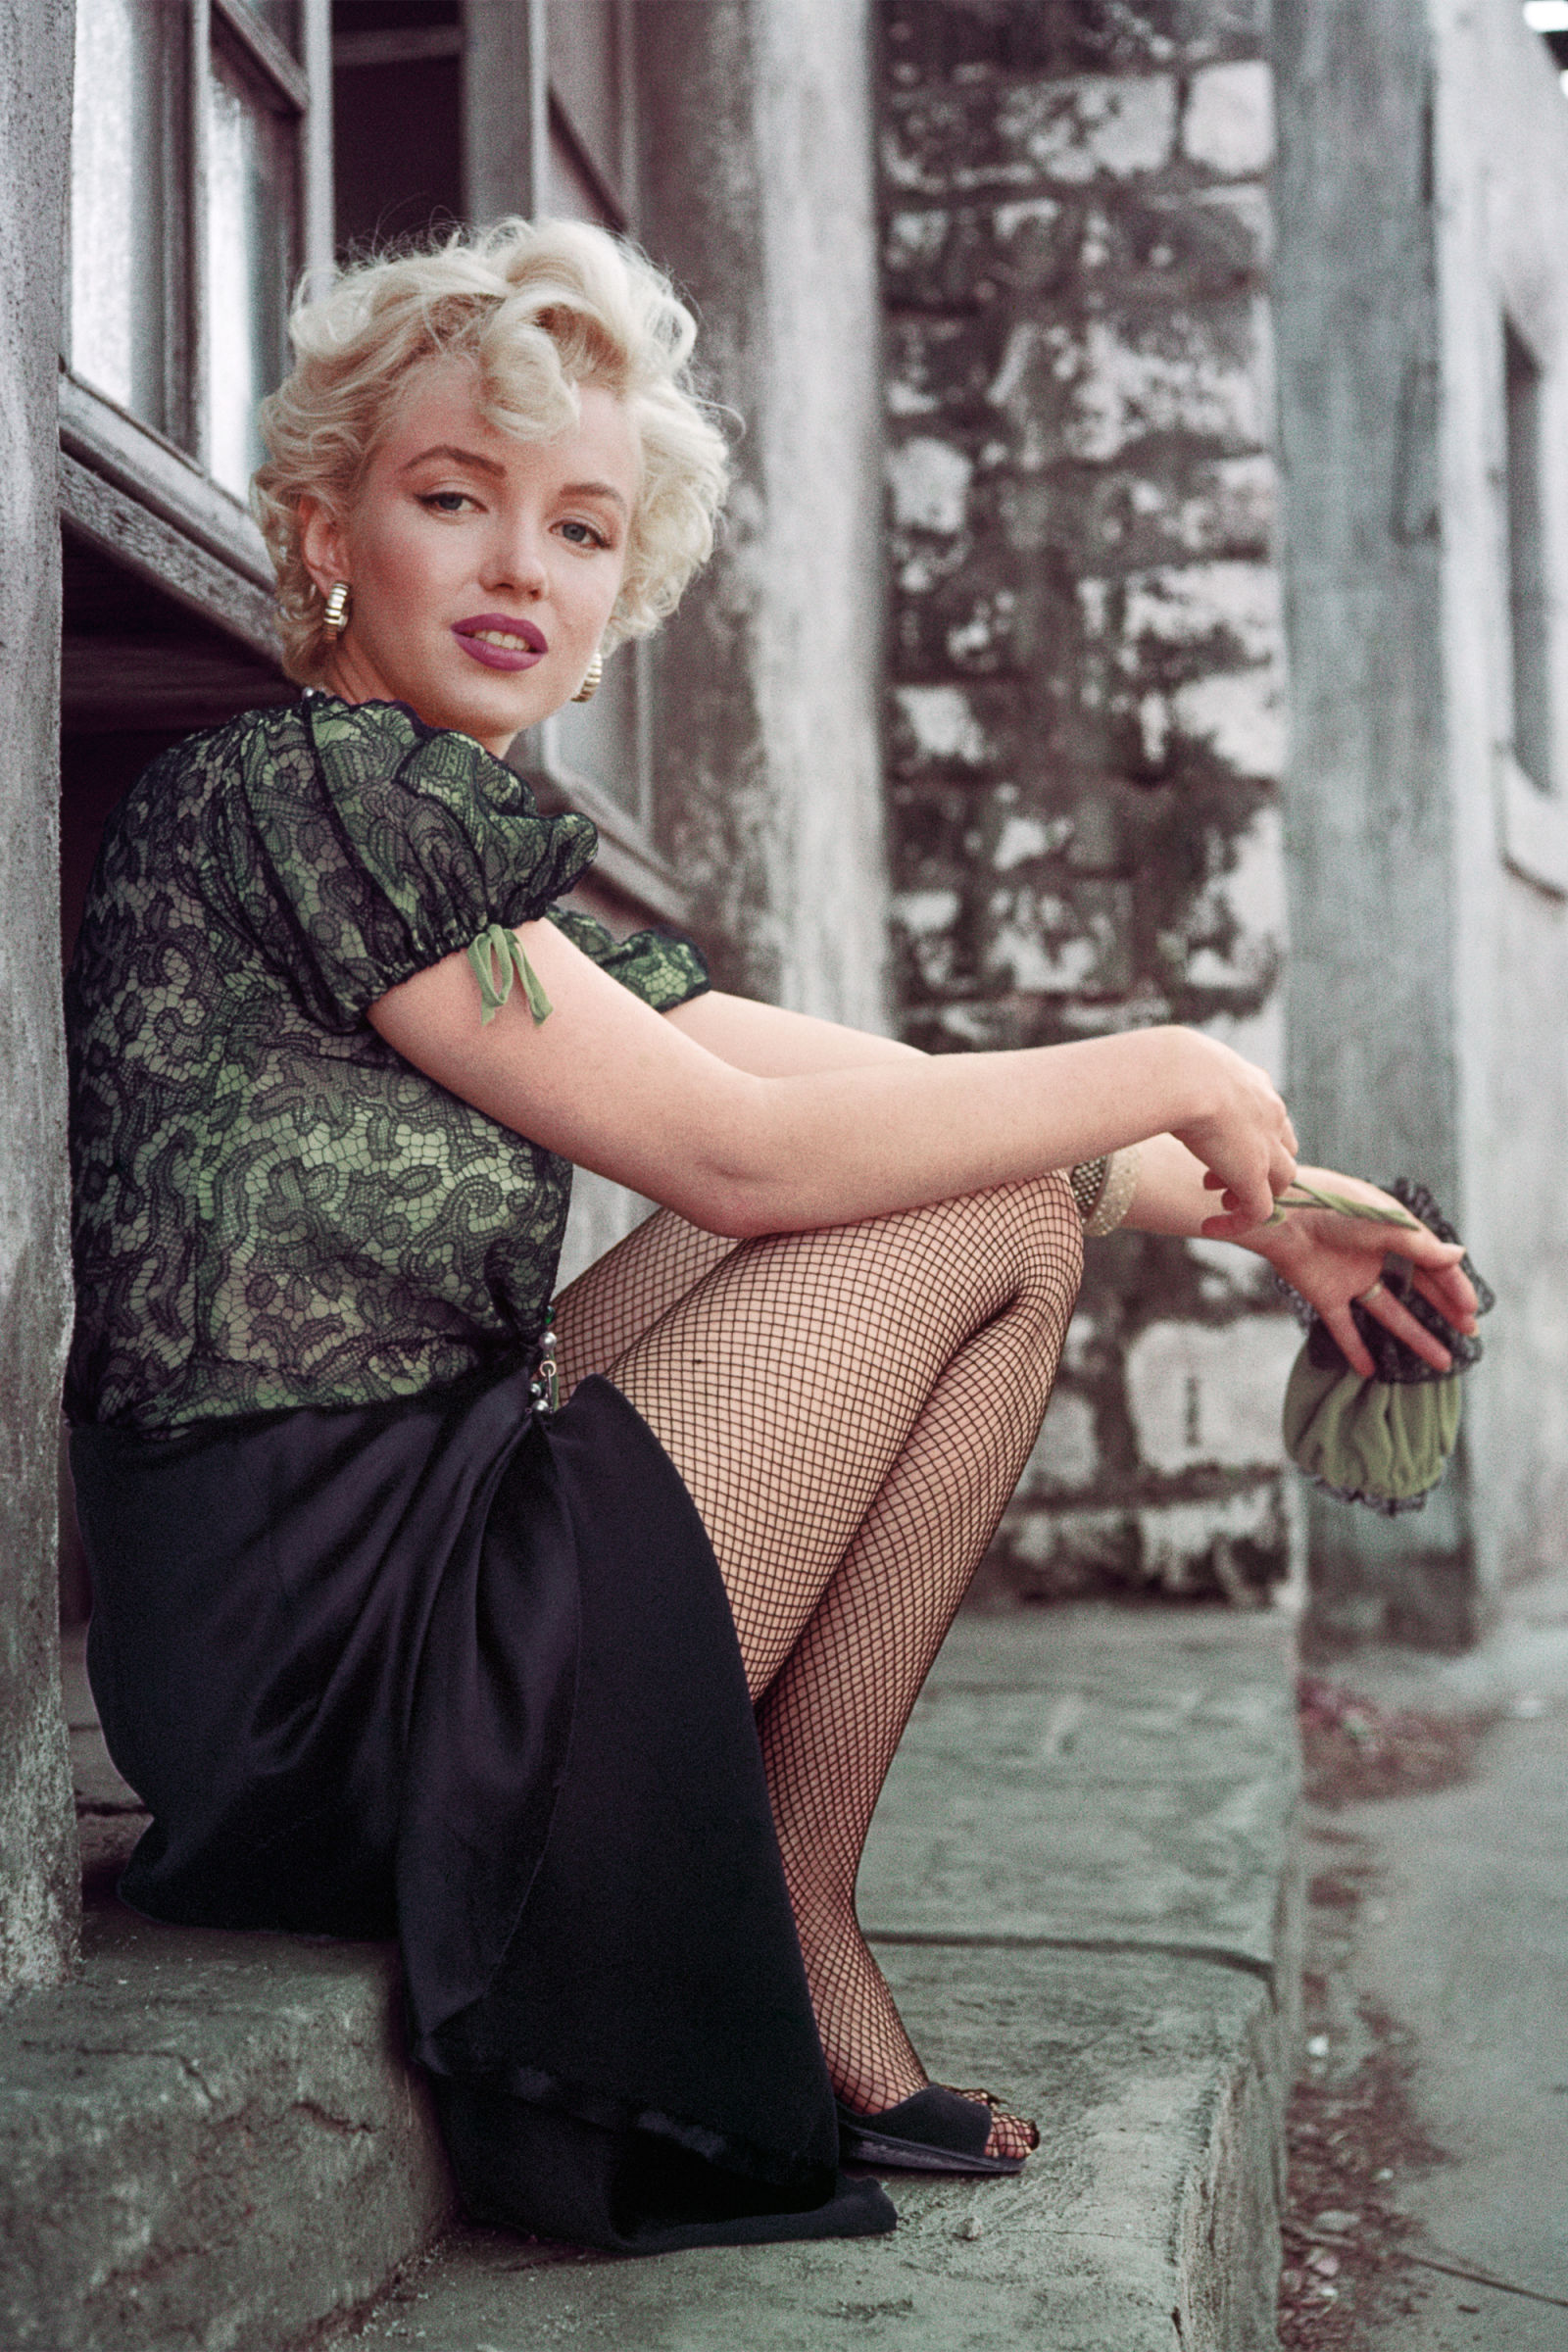 hbz-marilyn-the-hooker-sitting-la-1956-milton-h-greene-archive-images